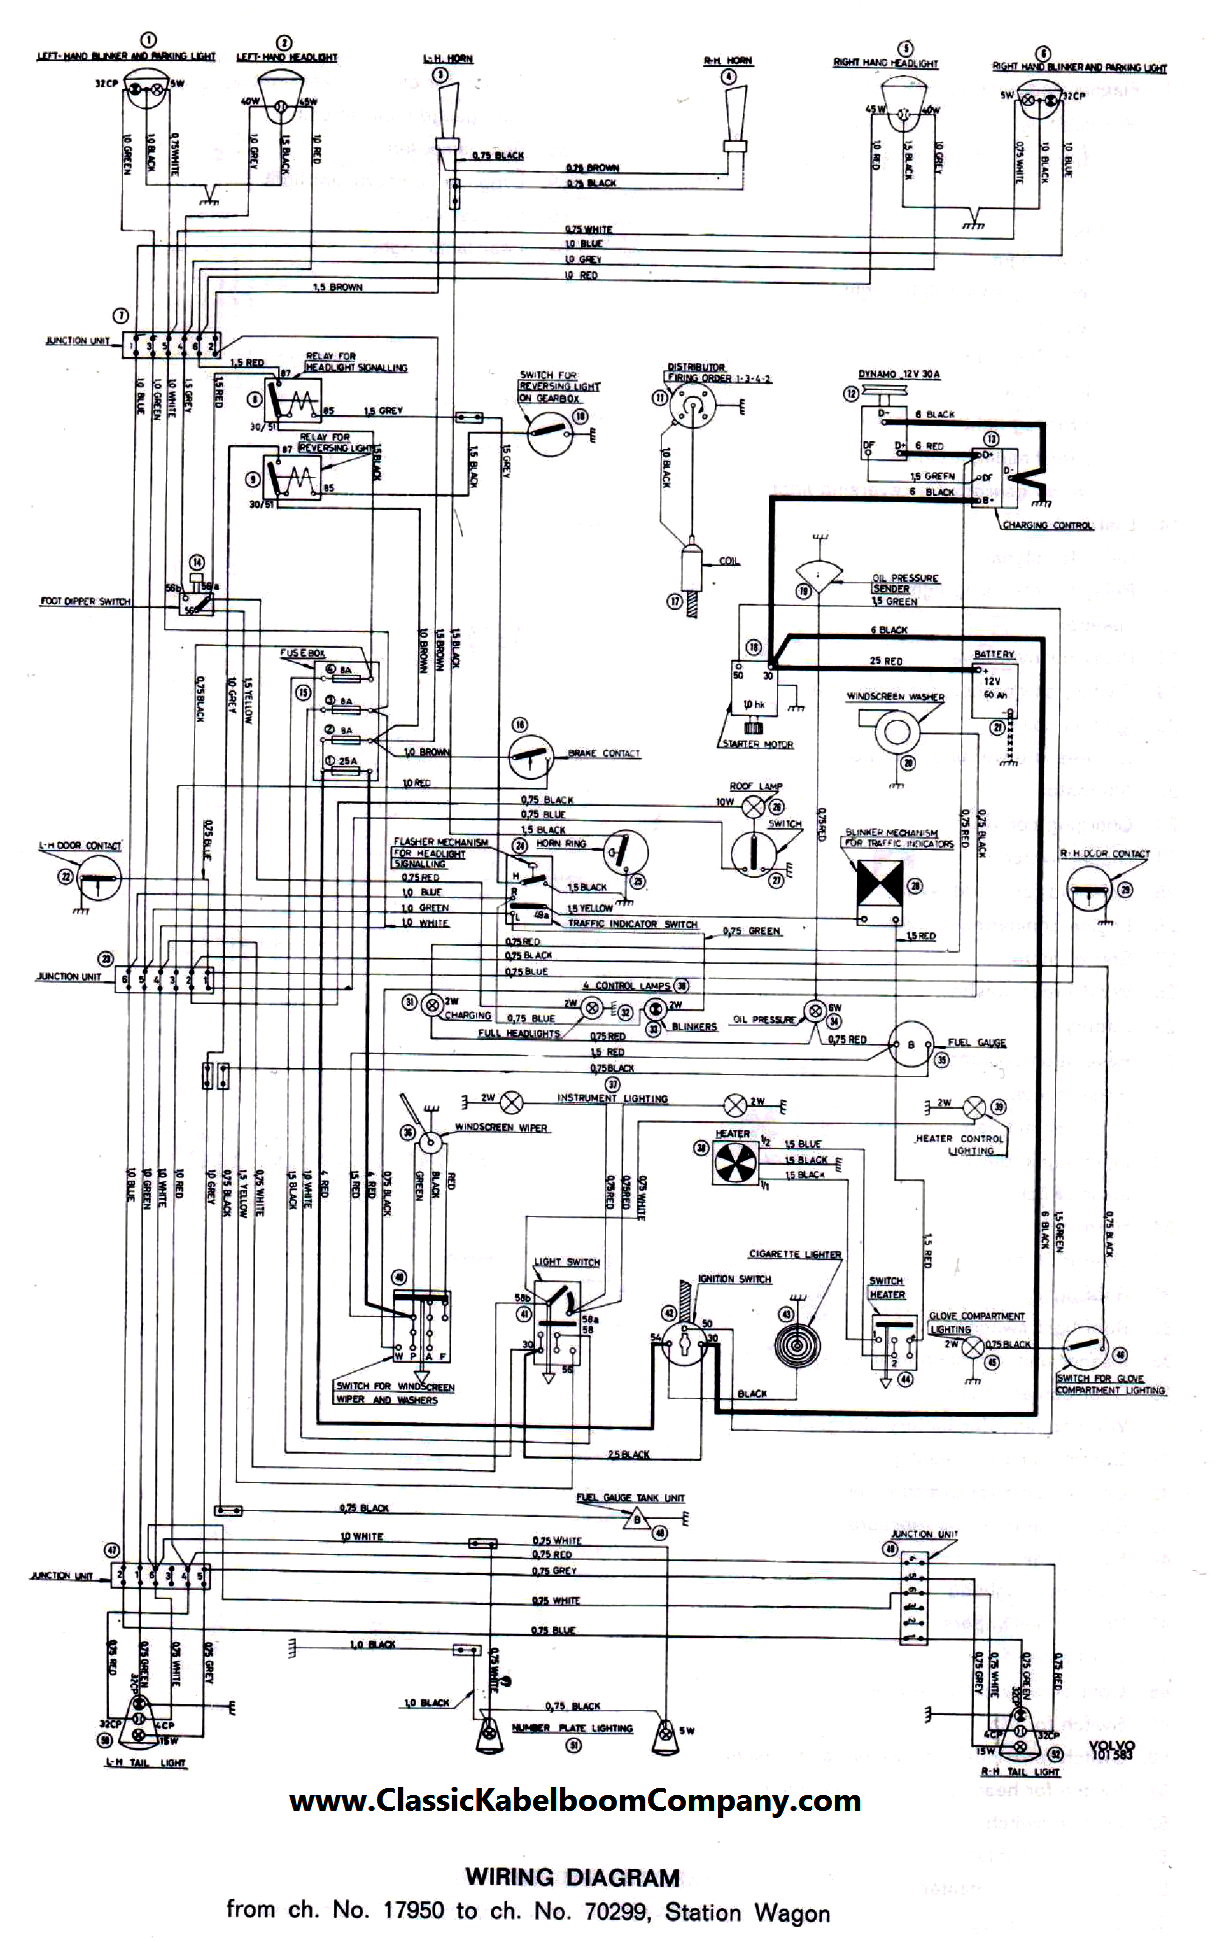 vol11?cdp=a classic kabelboom company elektrisch bedrading schema volvo 1977 Volvo 242 Stance at soozxer.org